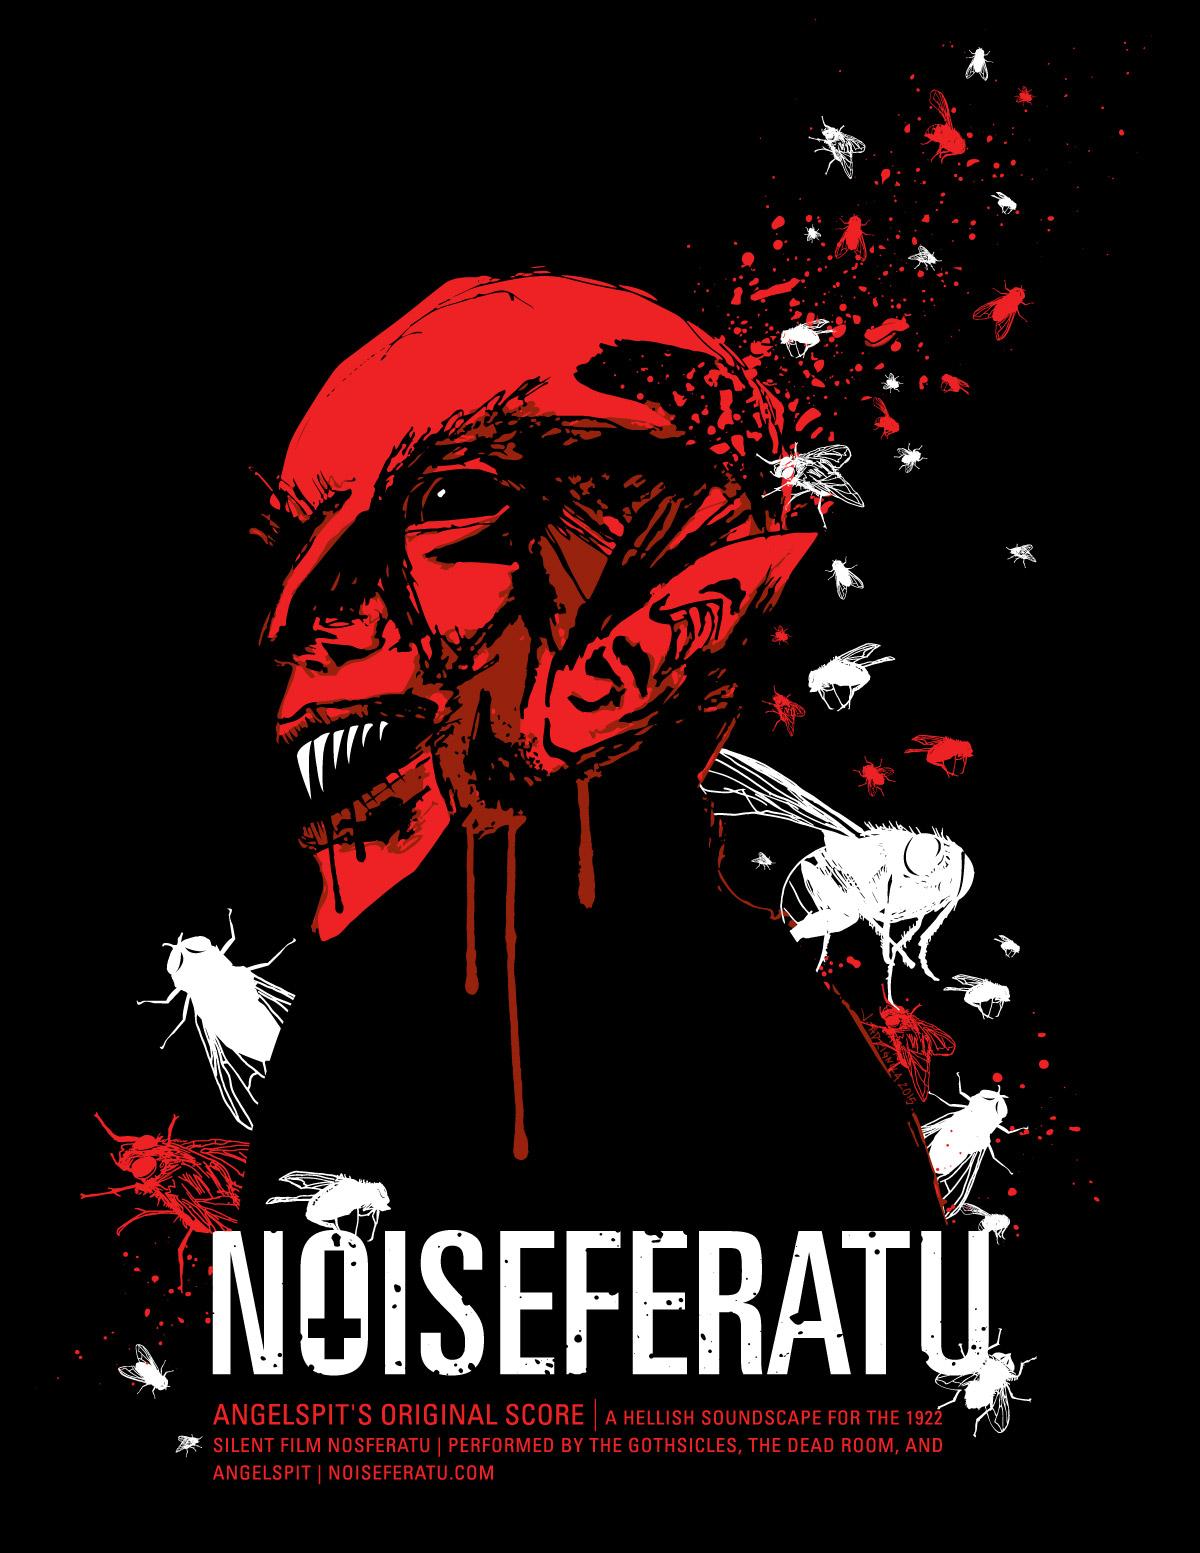 Angelspit Noiseferatu show poster by Jessi Adrignola